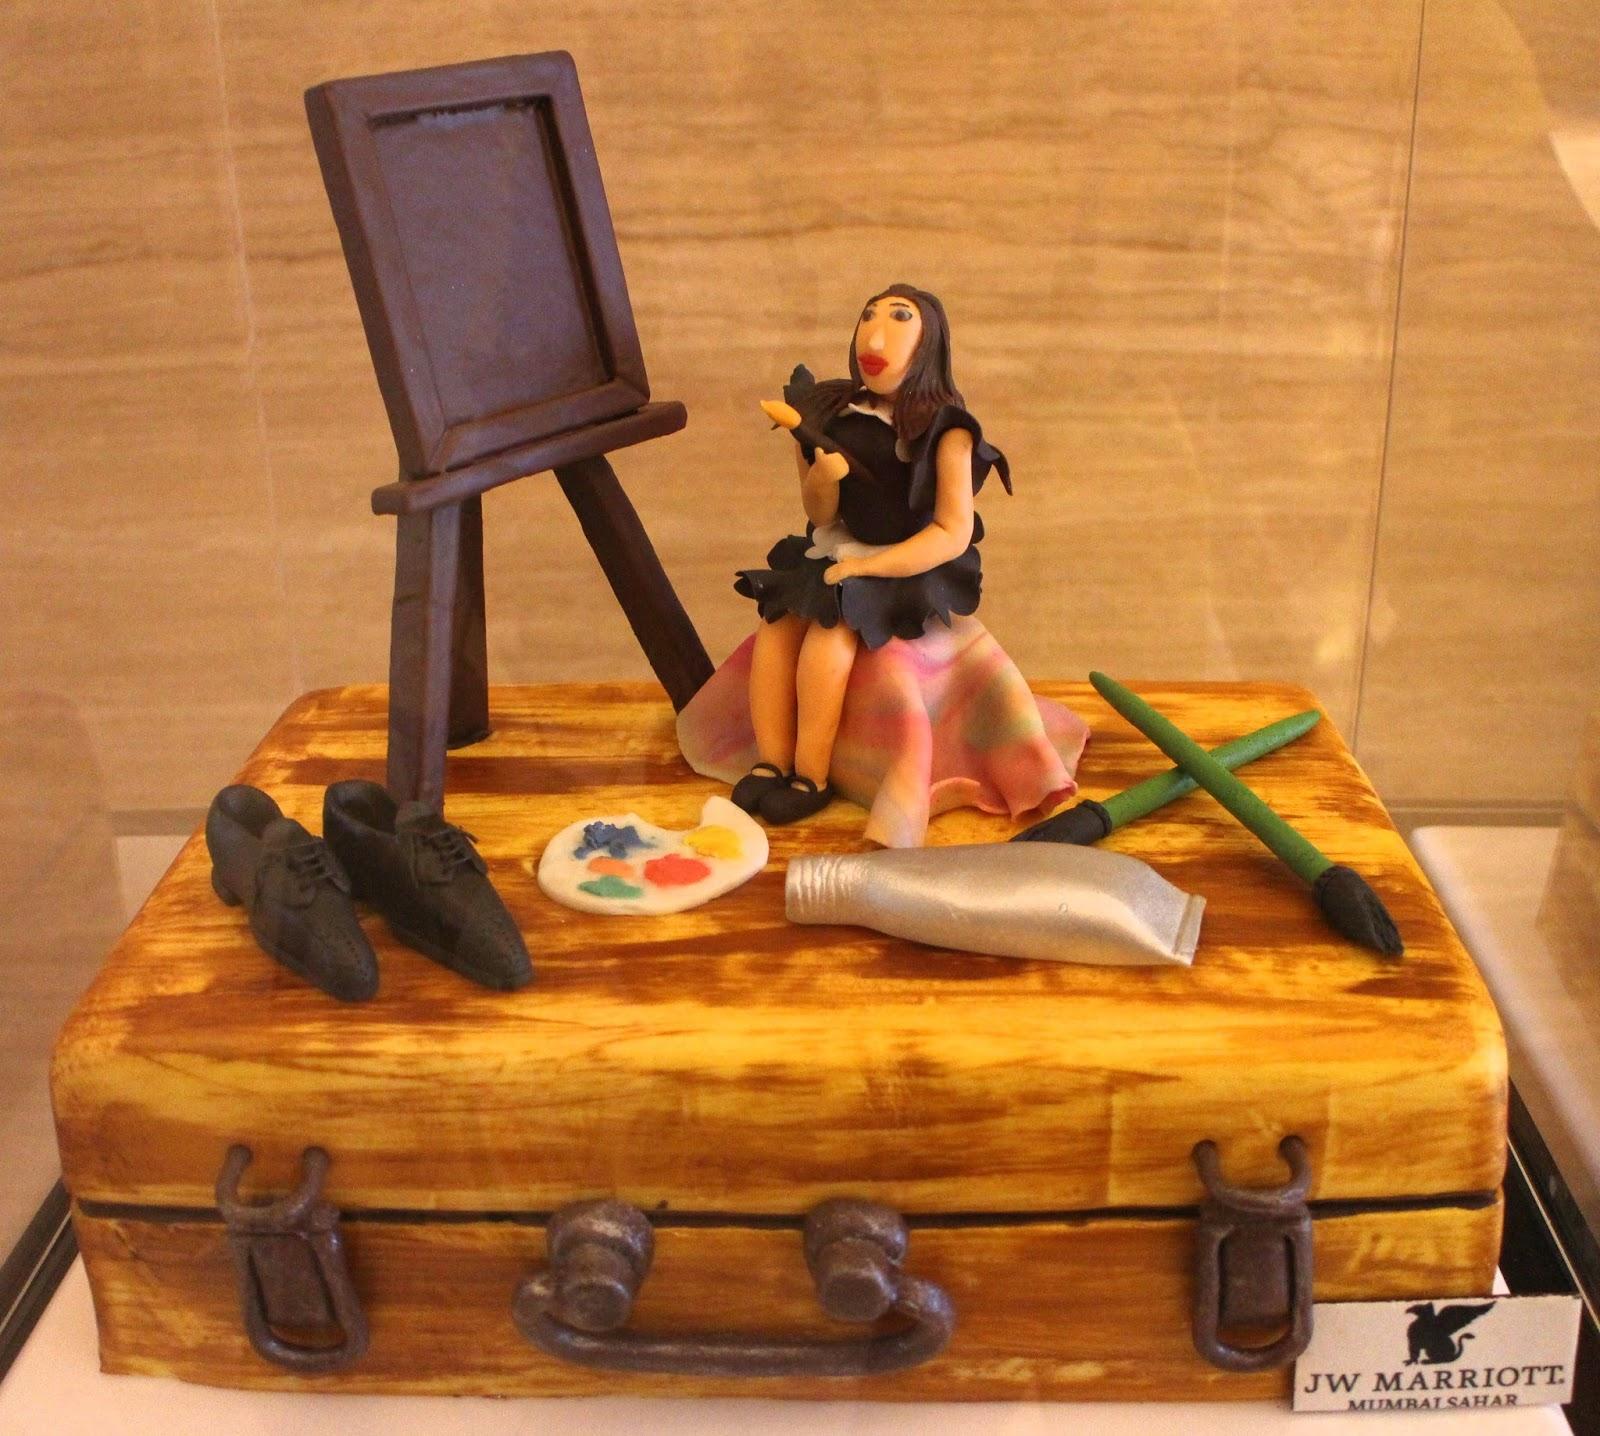 Cake Art Exhibit : My World: Cake Exhibition at J W Marriott Sahar Mumbai!!!